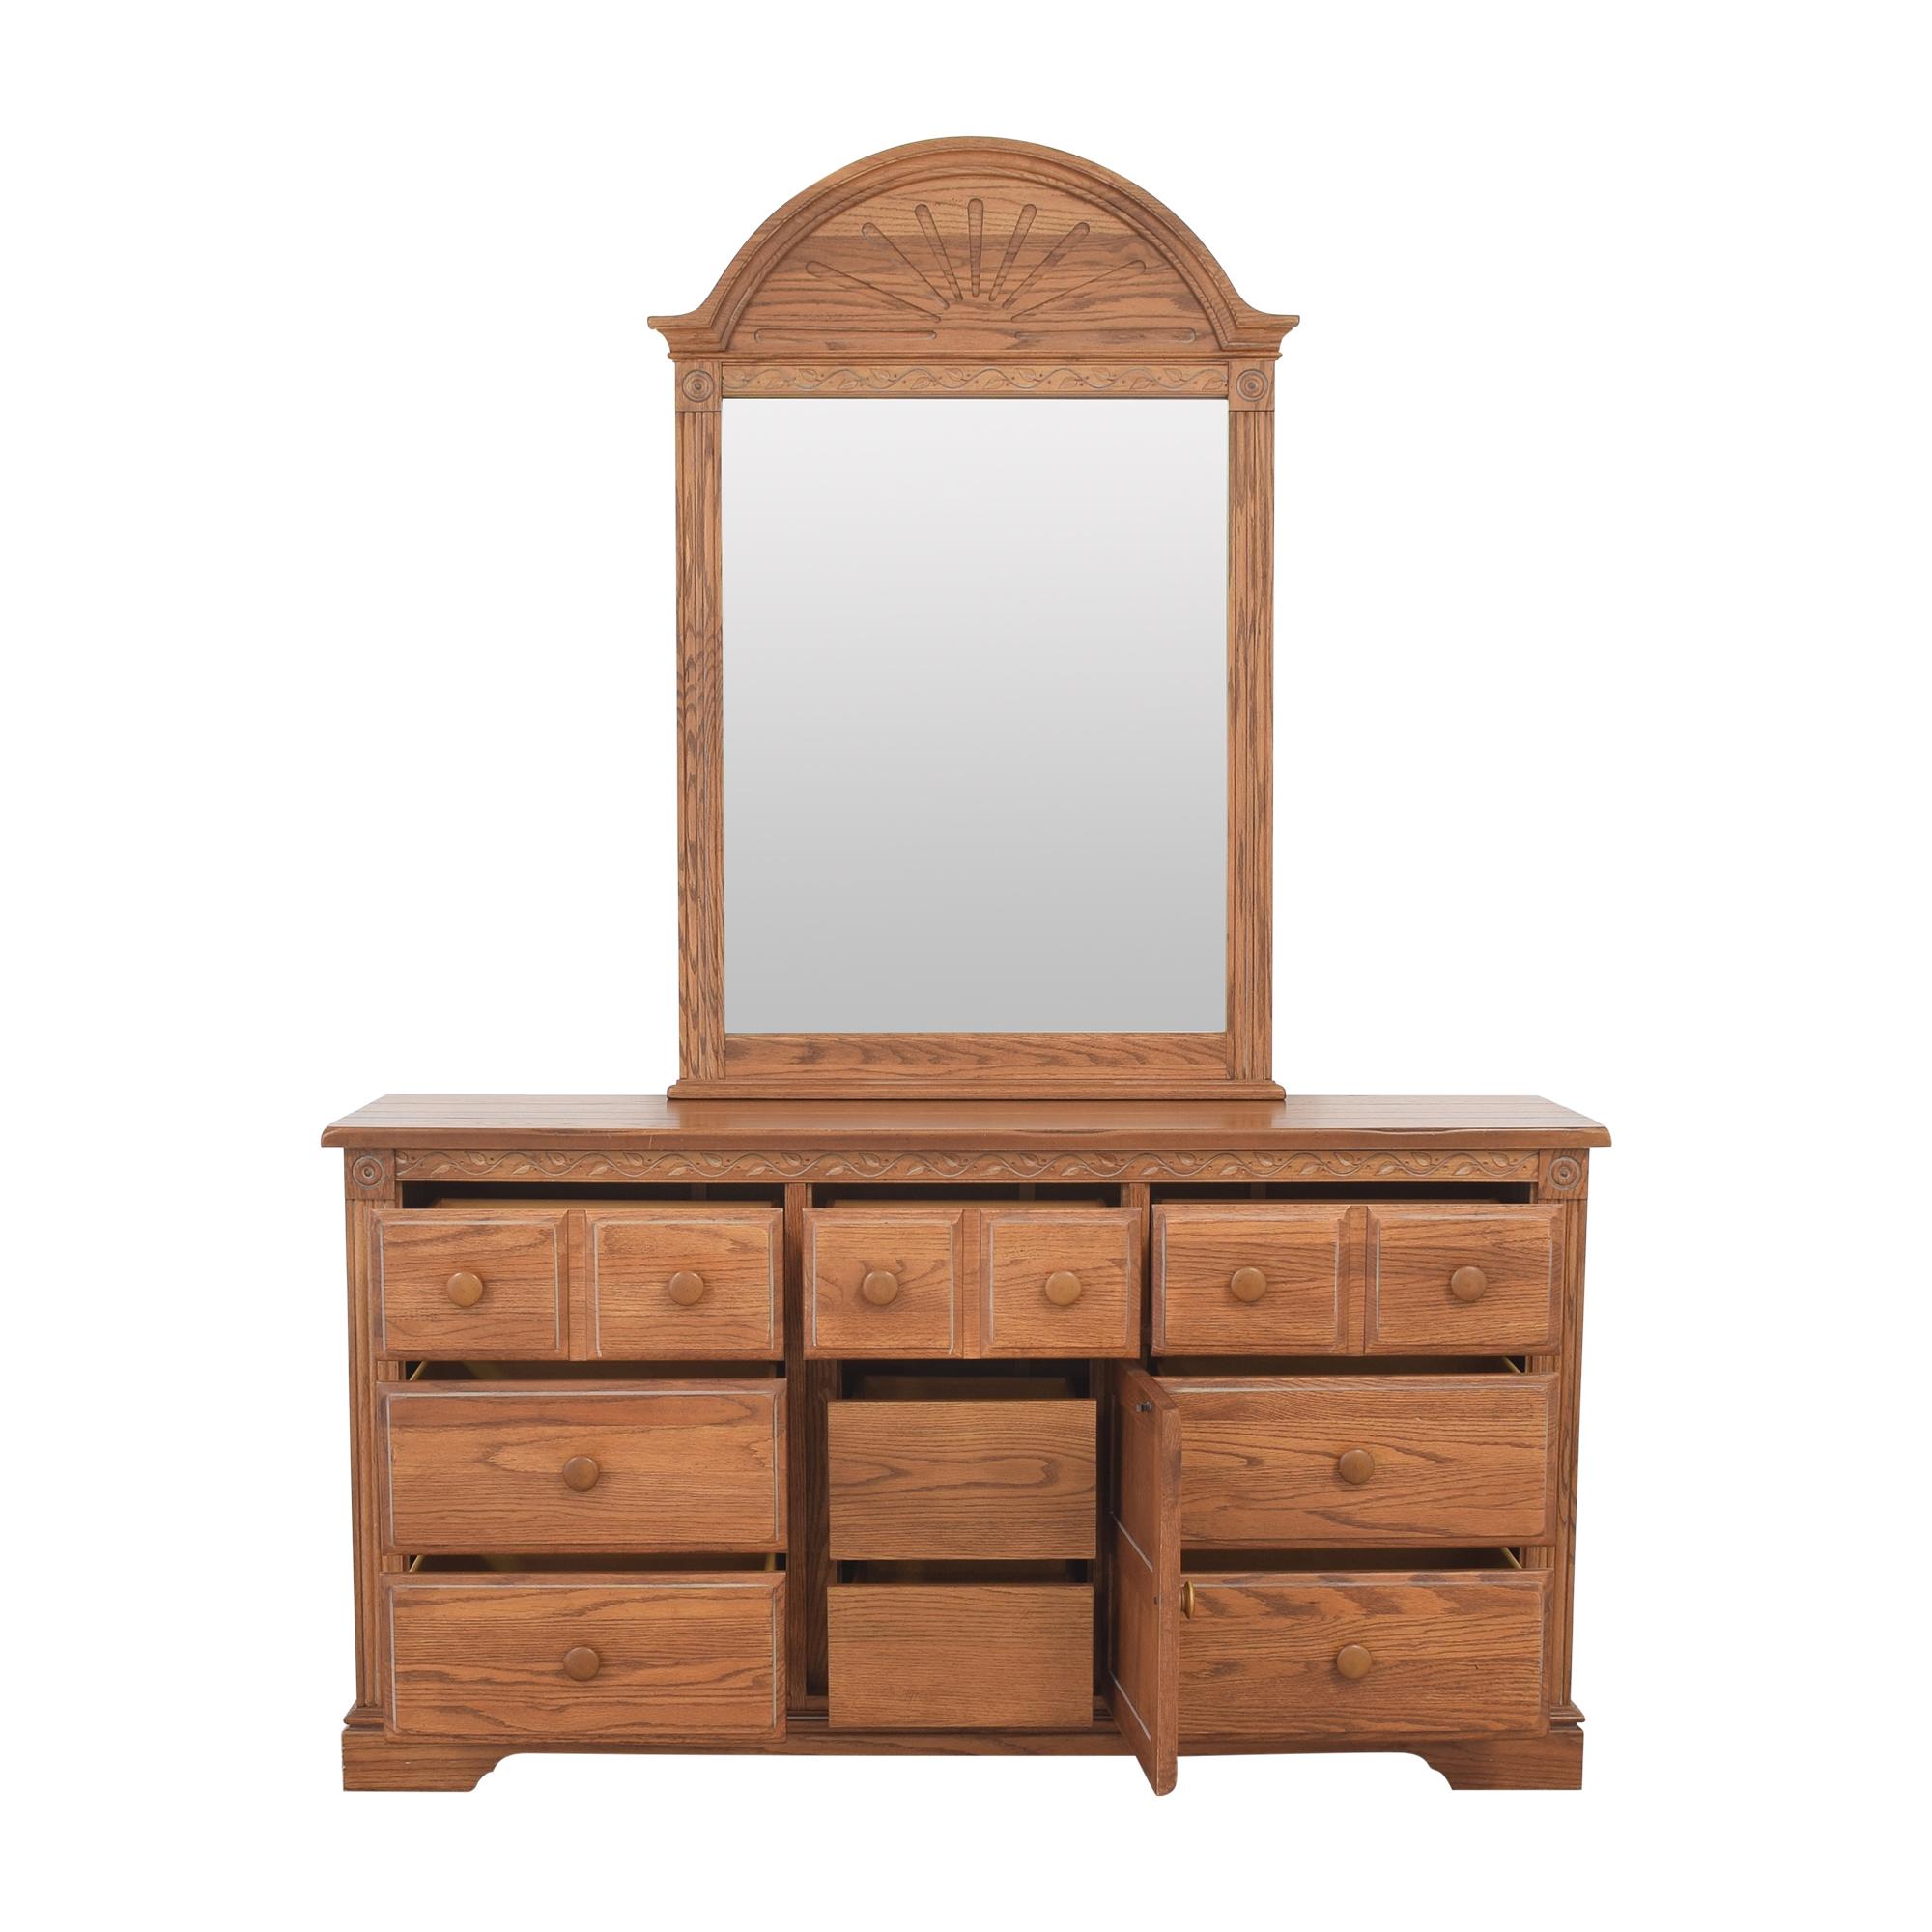 Broyhill Furniture Broyhill Door Dresser with Mirror light brown